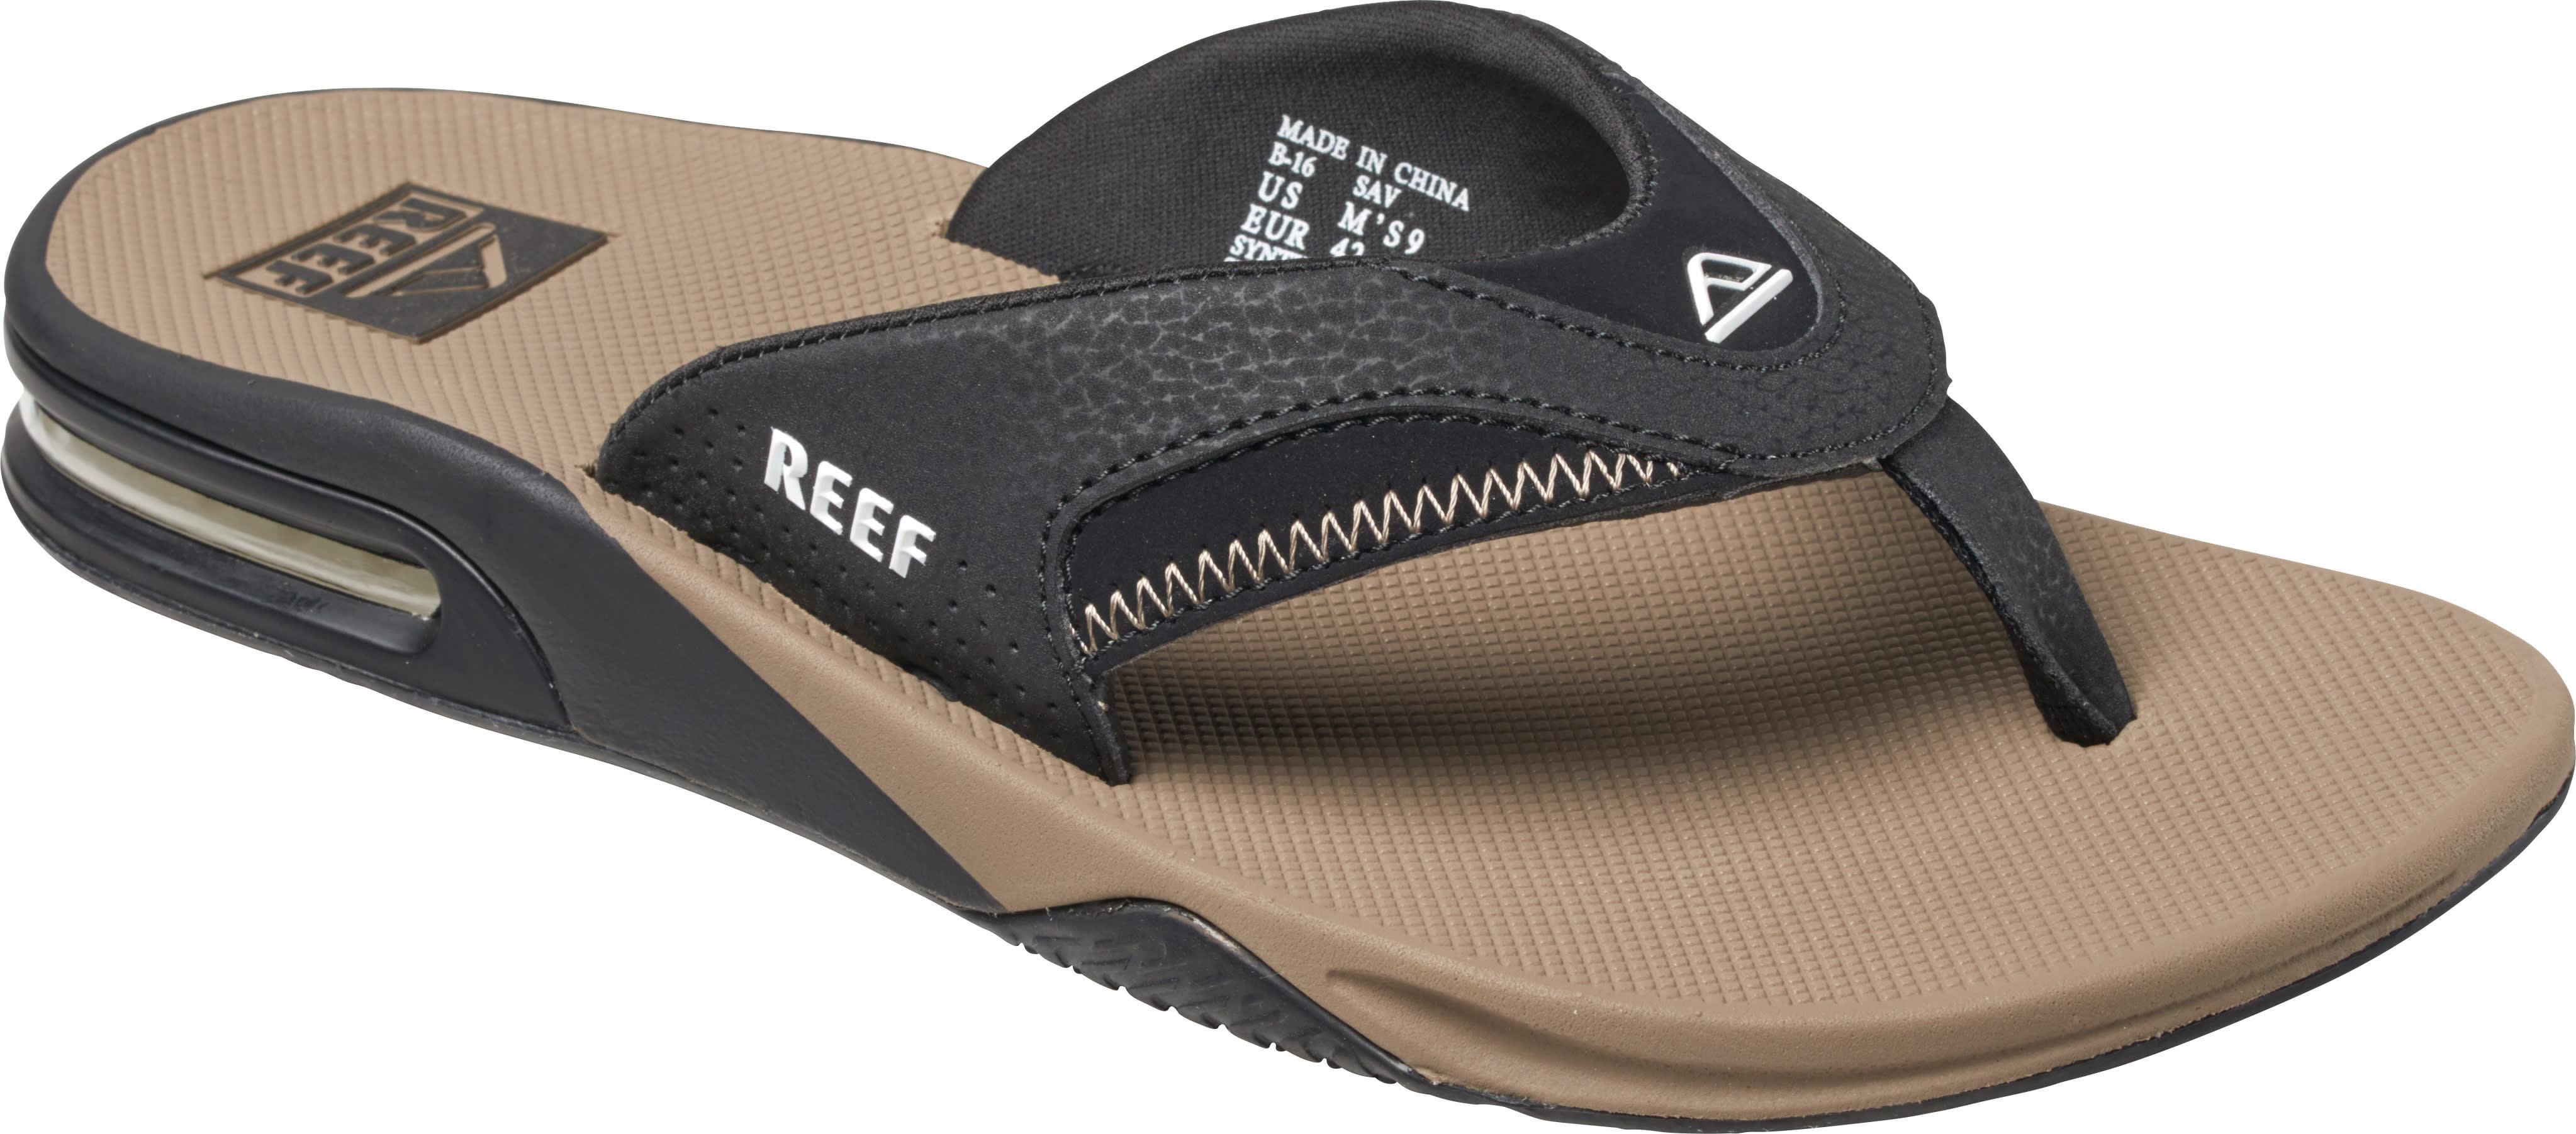 Black enclosed sandals - Black Enclosed Sandals 26